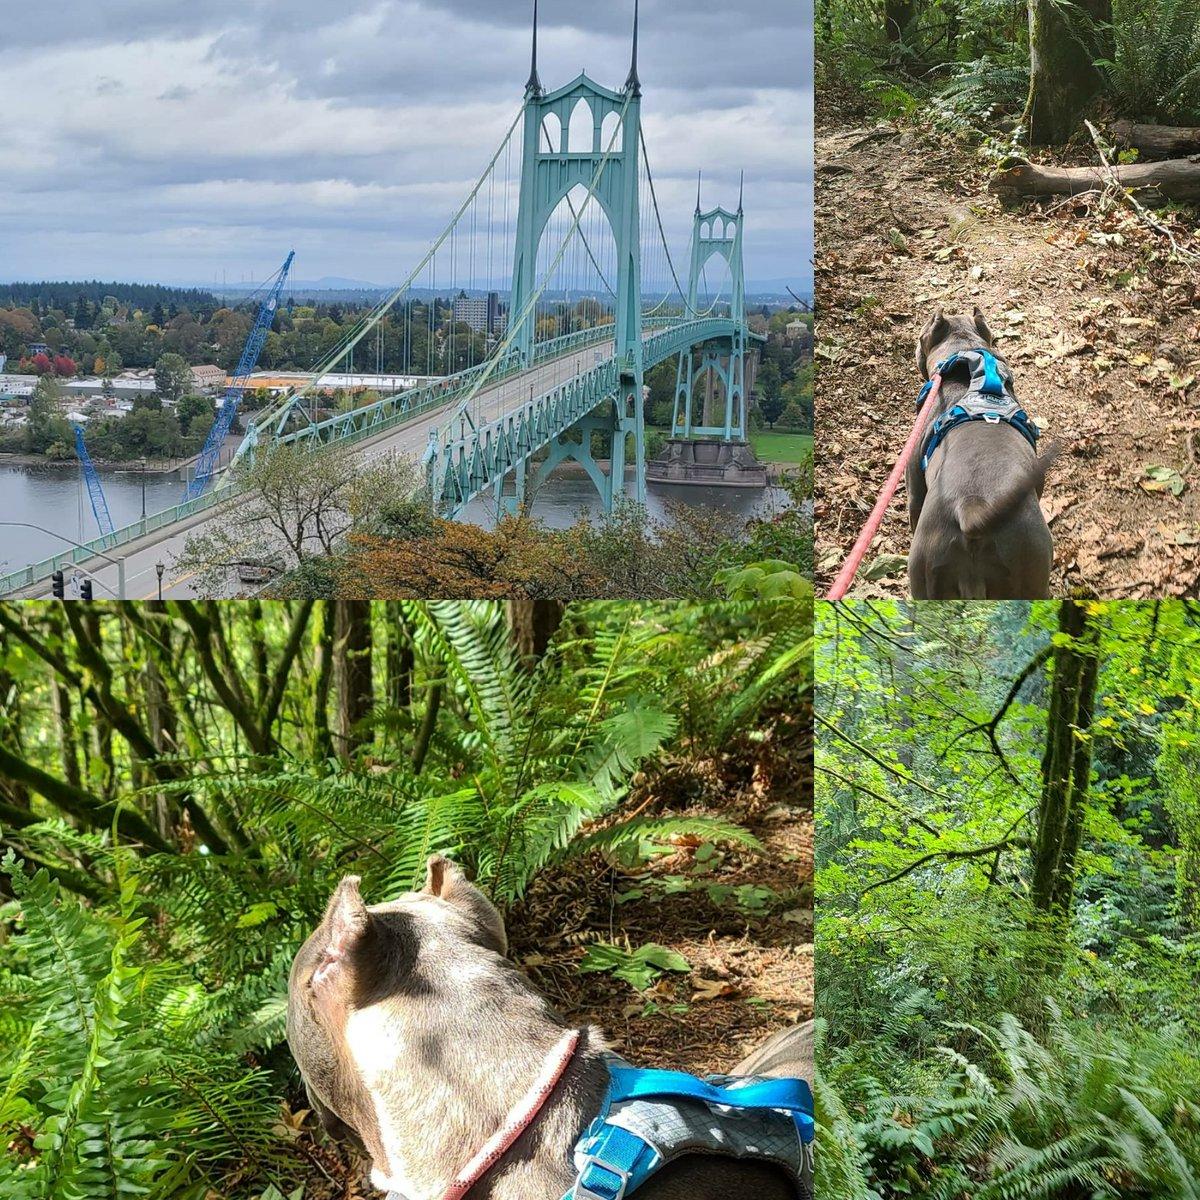 Fun adventure today. #forestpark #hikingadventures https://t.co/z3TylCxGns